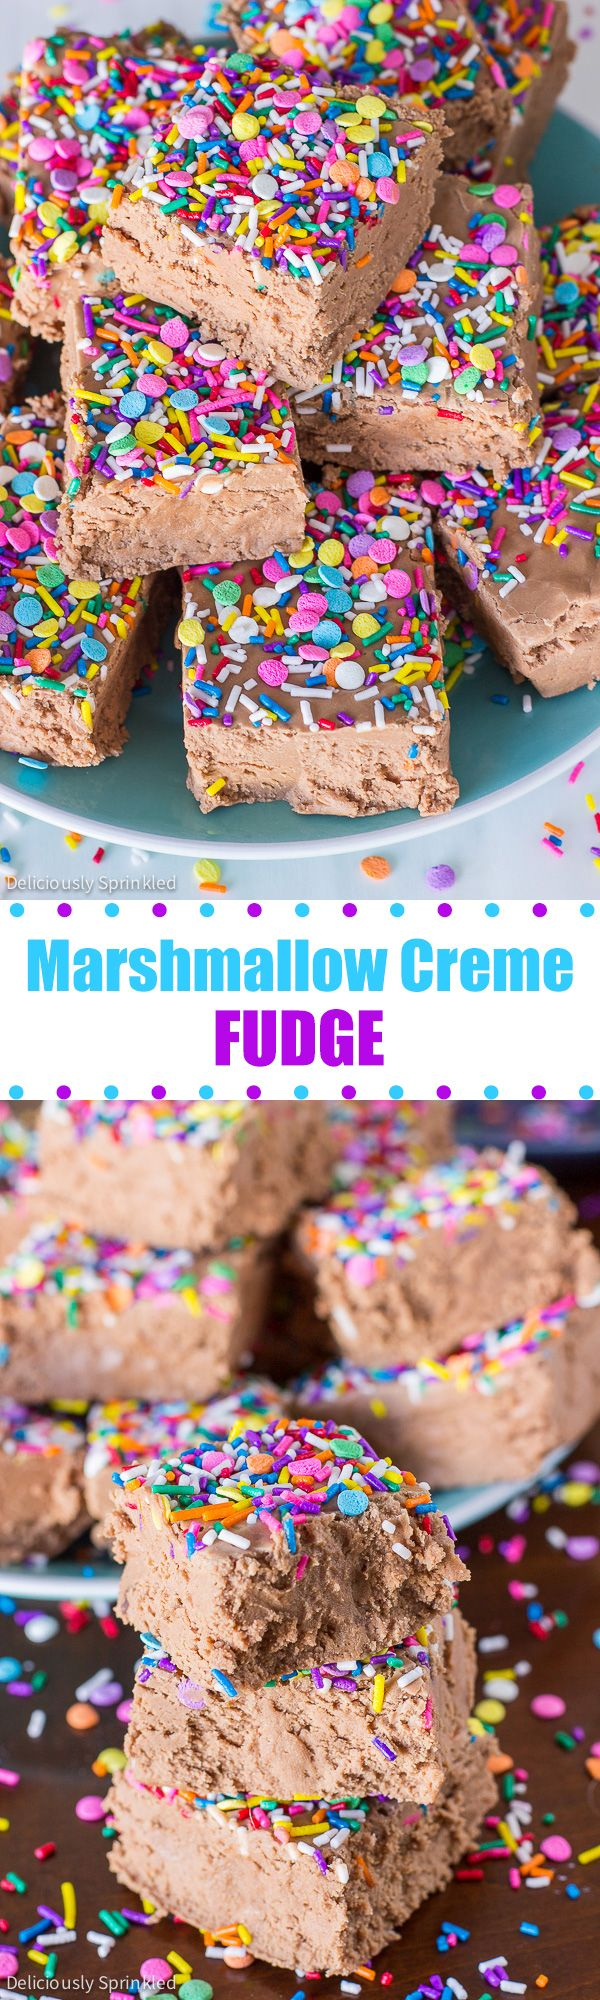 Easy to make Marshmallow Creme Fudge